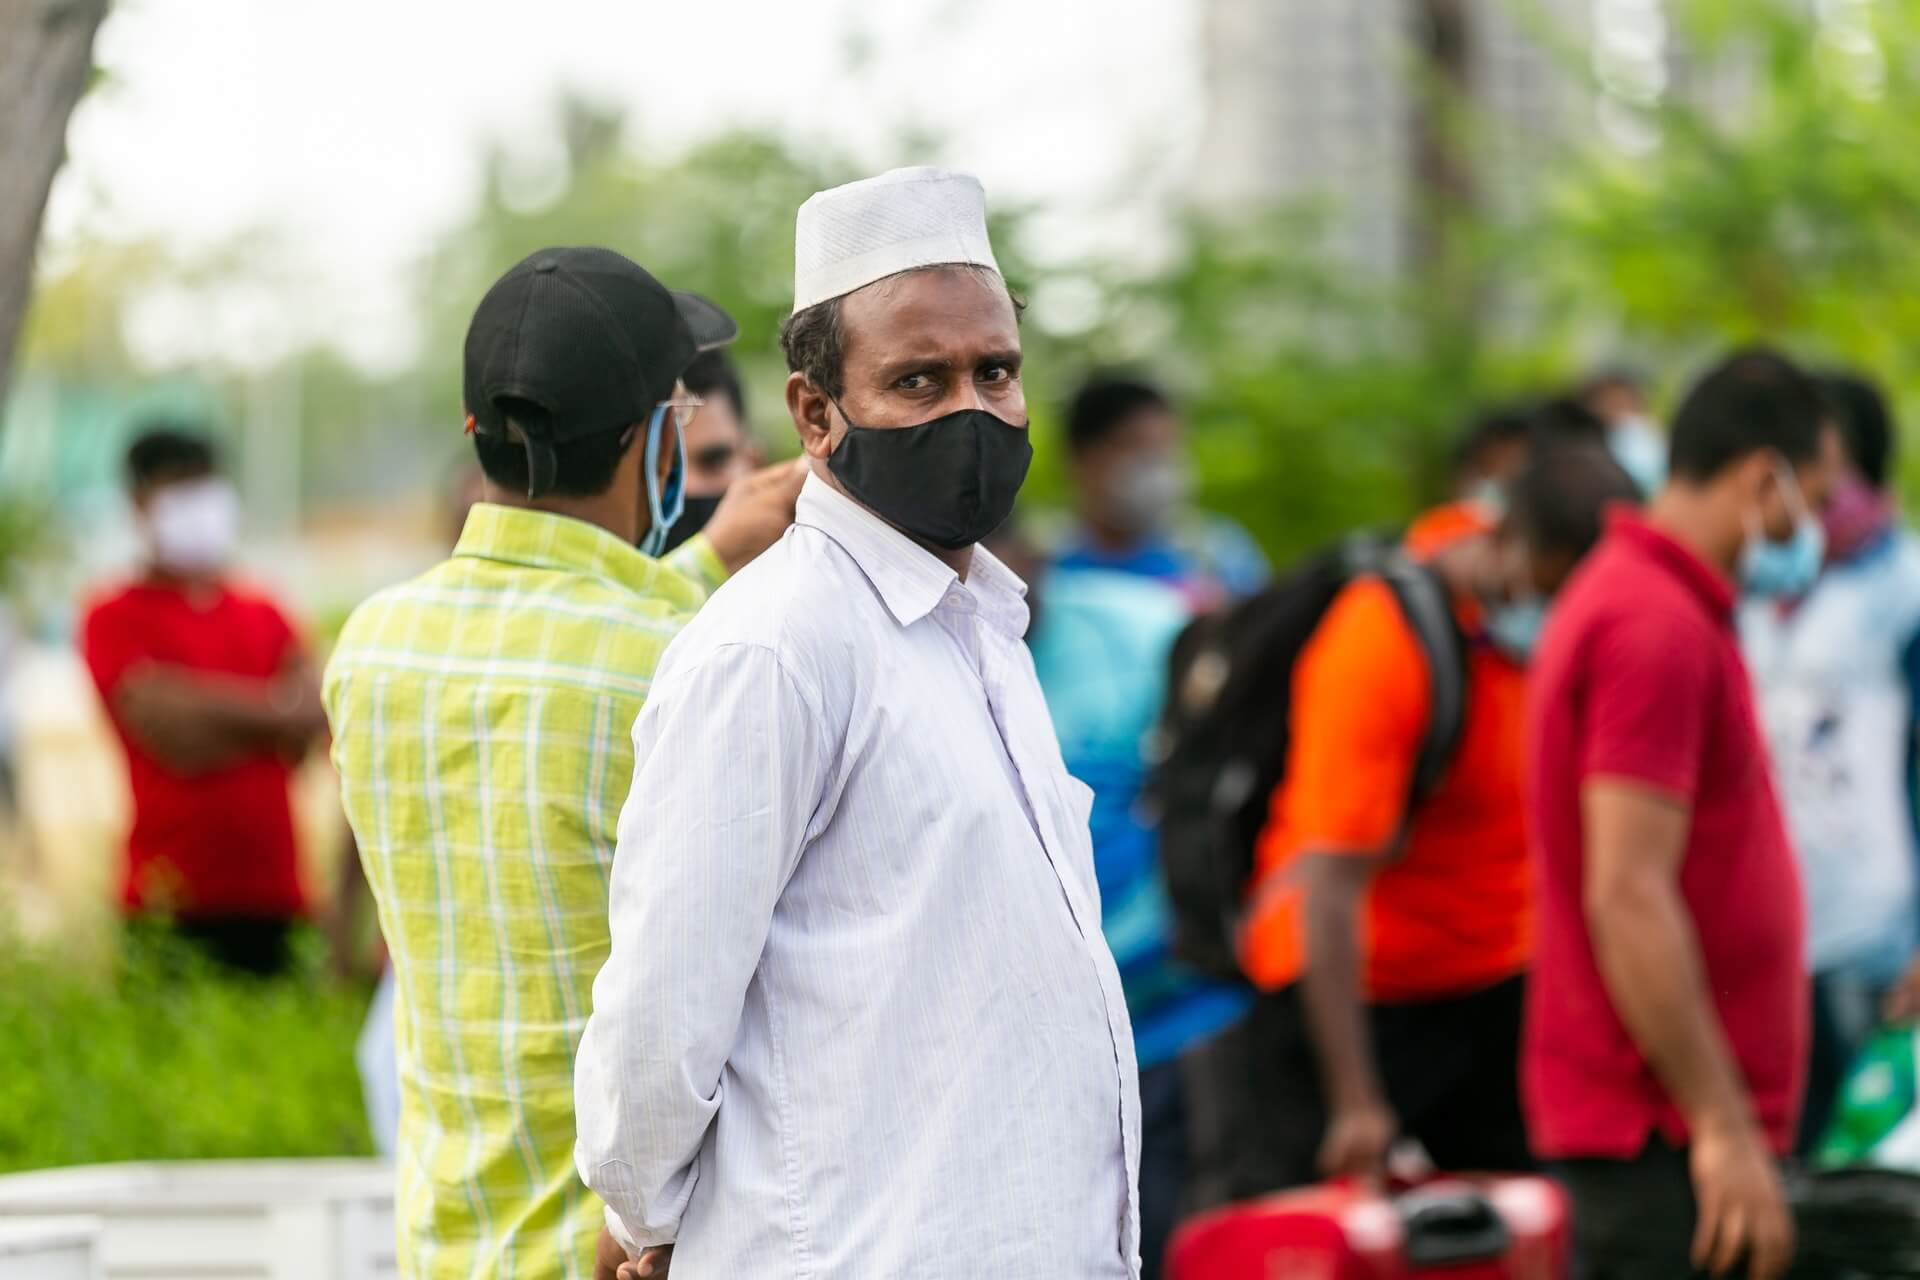 Коронавирус на Мальдивах: все о ситуации в стране, а также правила въезда